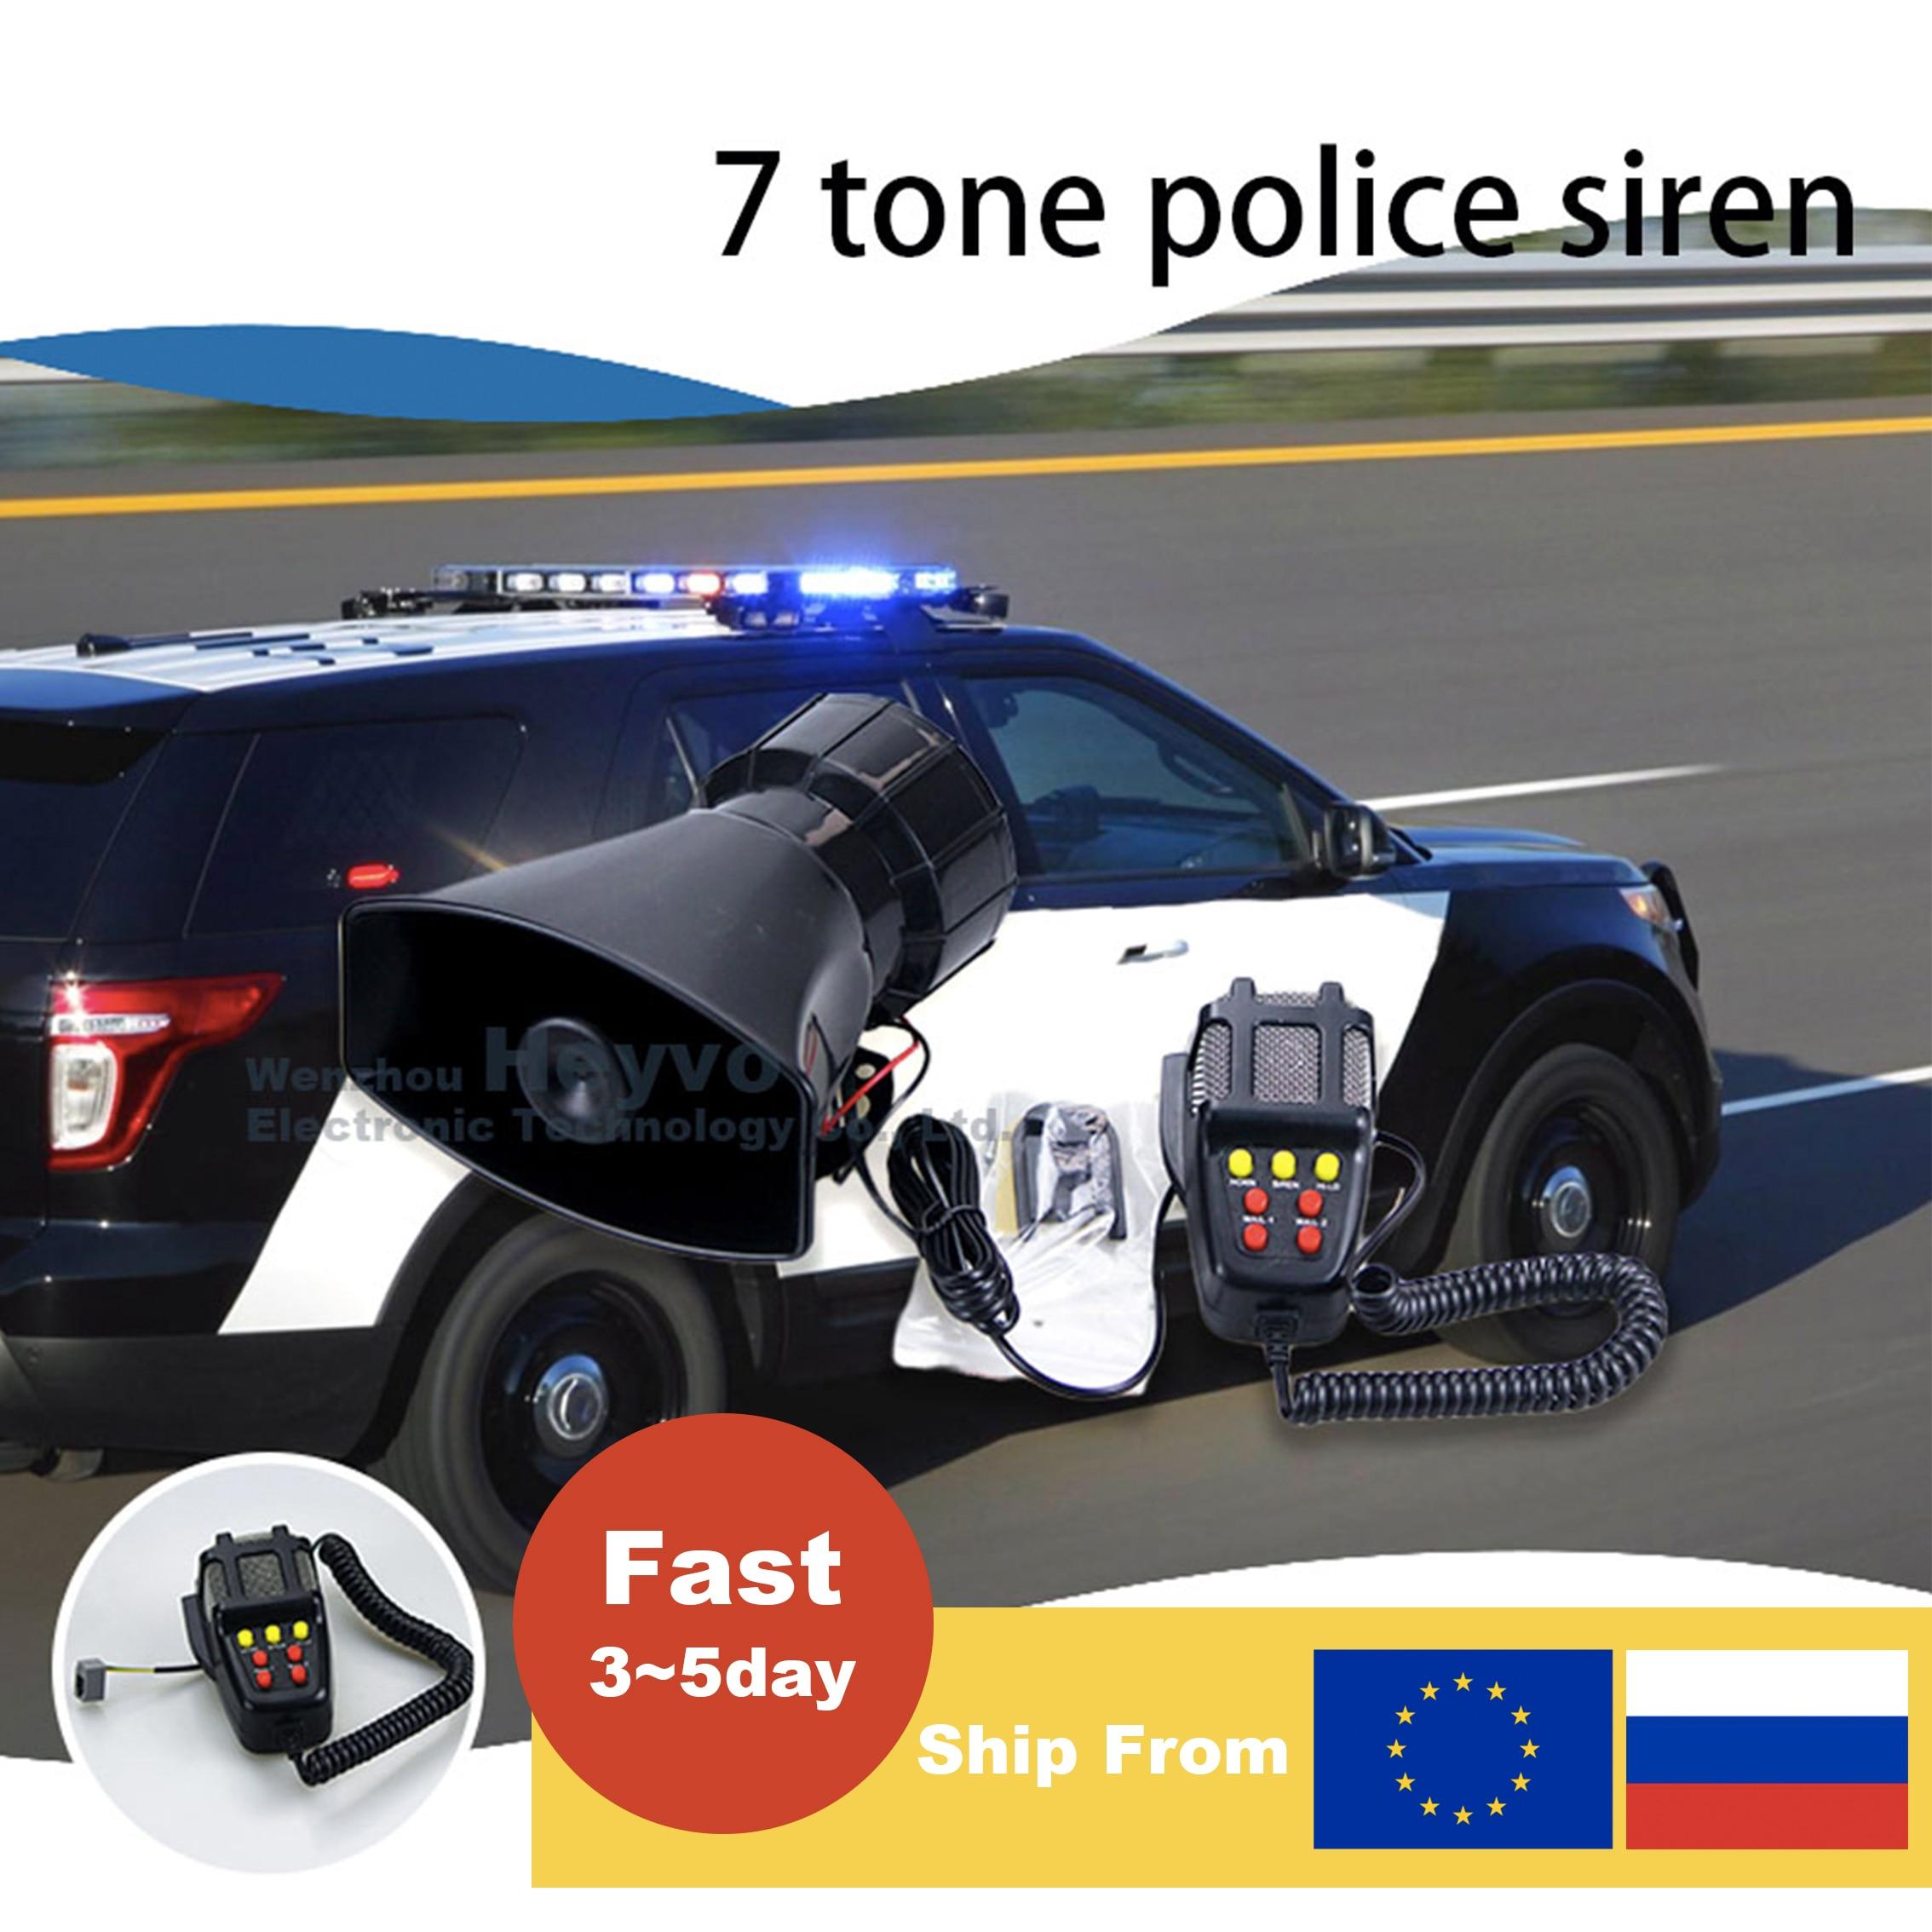 12V Polic Siren Emergency Fire Car Horn 7-Sound Loud Car Warning Alarm With Mic PA  Speaker System Amplifier Hooter Megaphone 1set tone sound car emergency siren horn emergency amplifier hooter 12v 100w